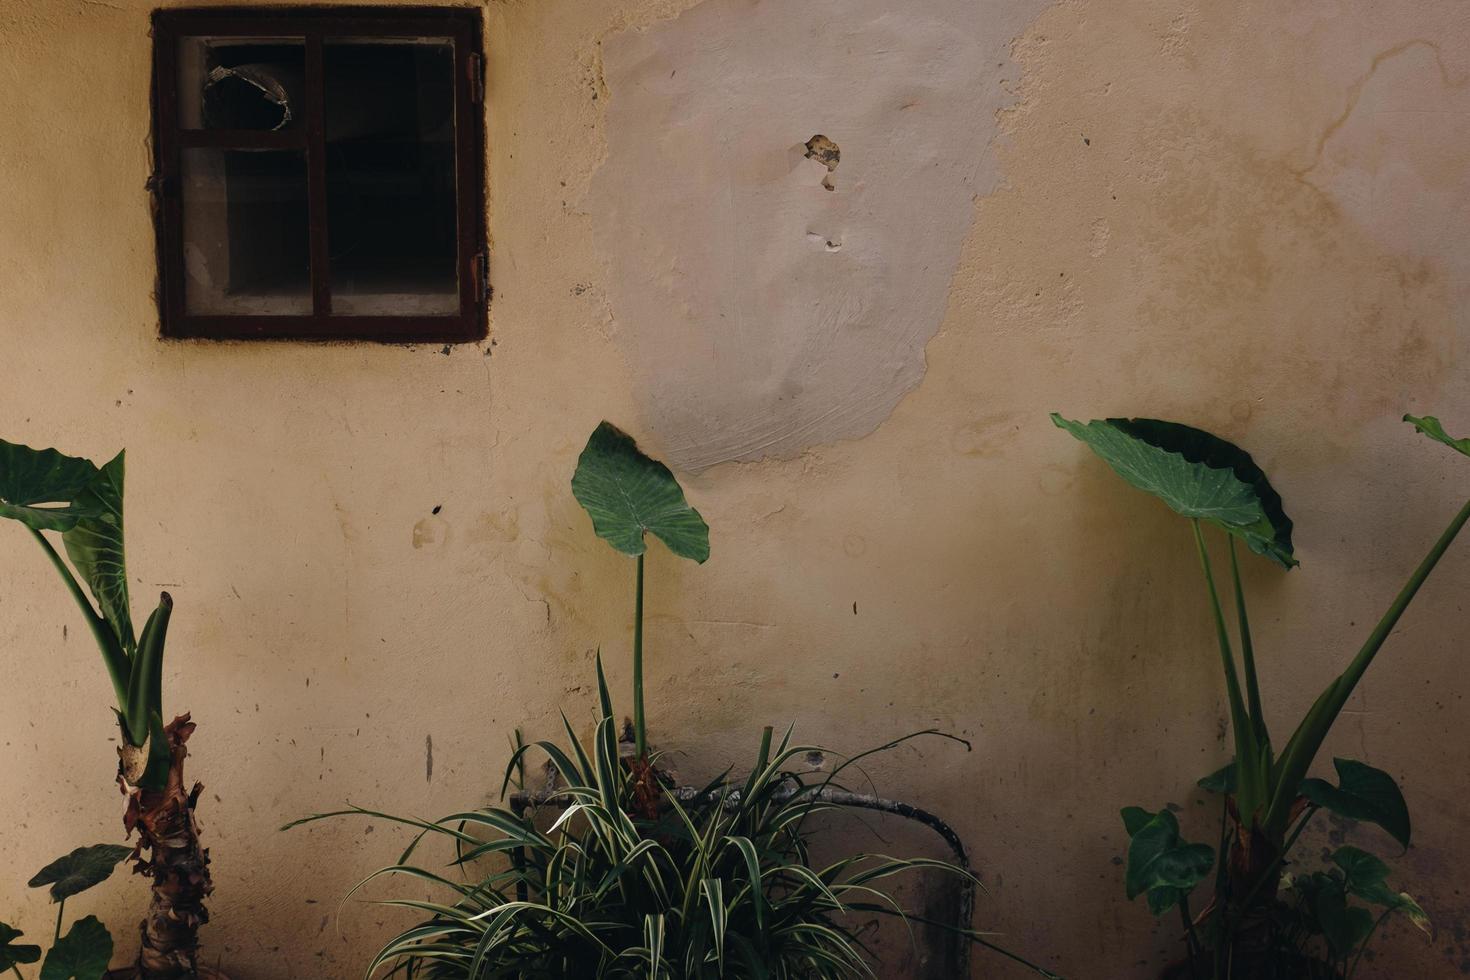 Green plants near wall photo